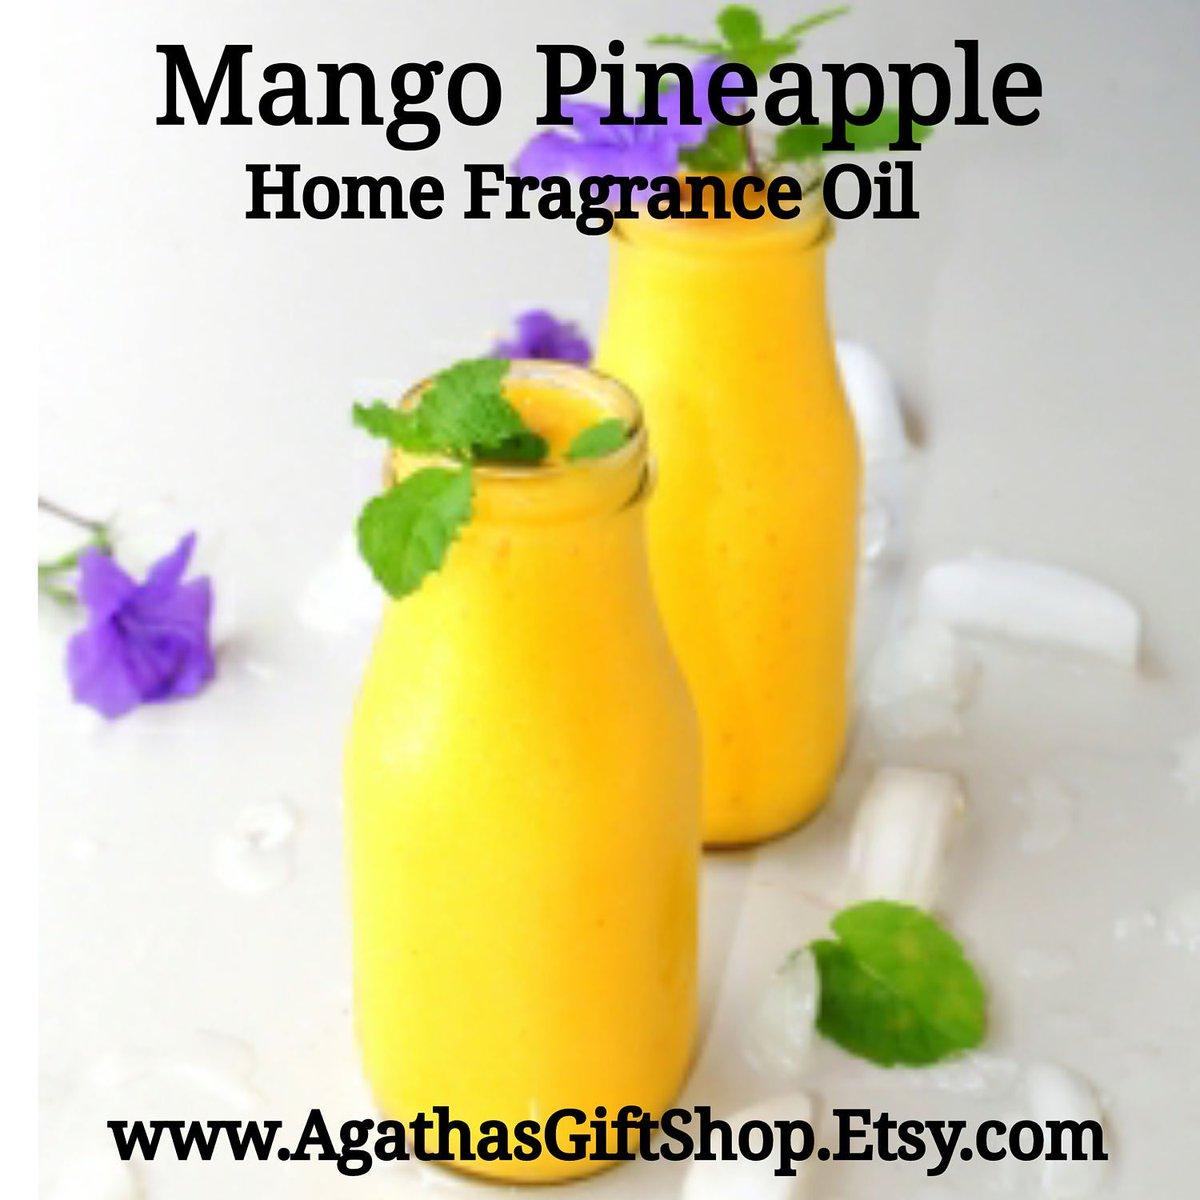 Mango Pineapple Home Fragrance Diffuser Warmer Aromatherapy Burning Oil  #CyberMonday #AromatherapyOil #HomeFragranceOil #BlackFriday #Wedding #Etsy #HerbalRemedies #Incense #PerfumeBodyOils #GiftShopSale #Etsygifts